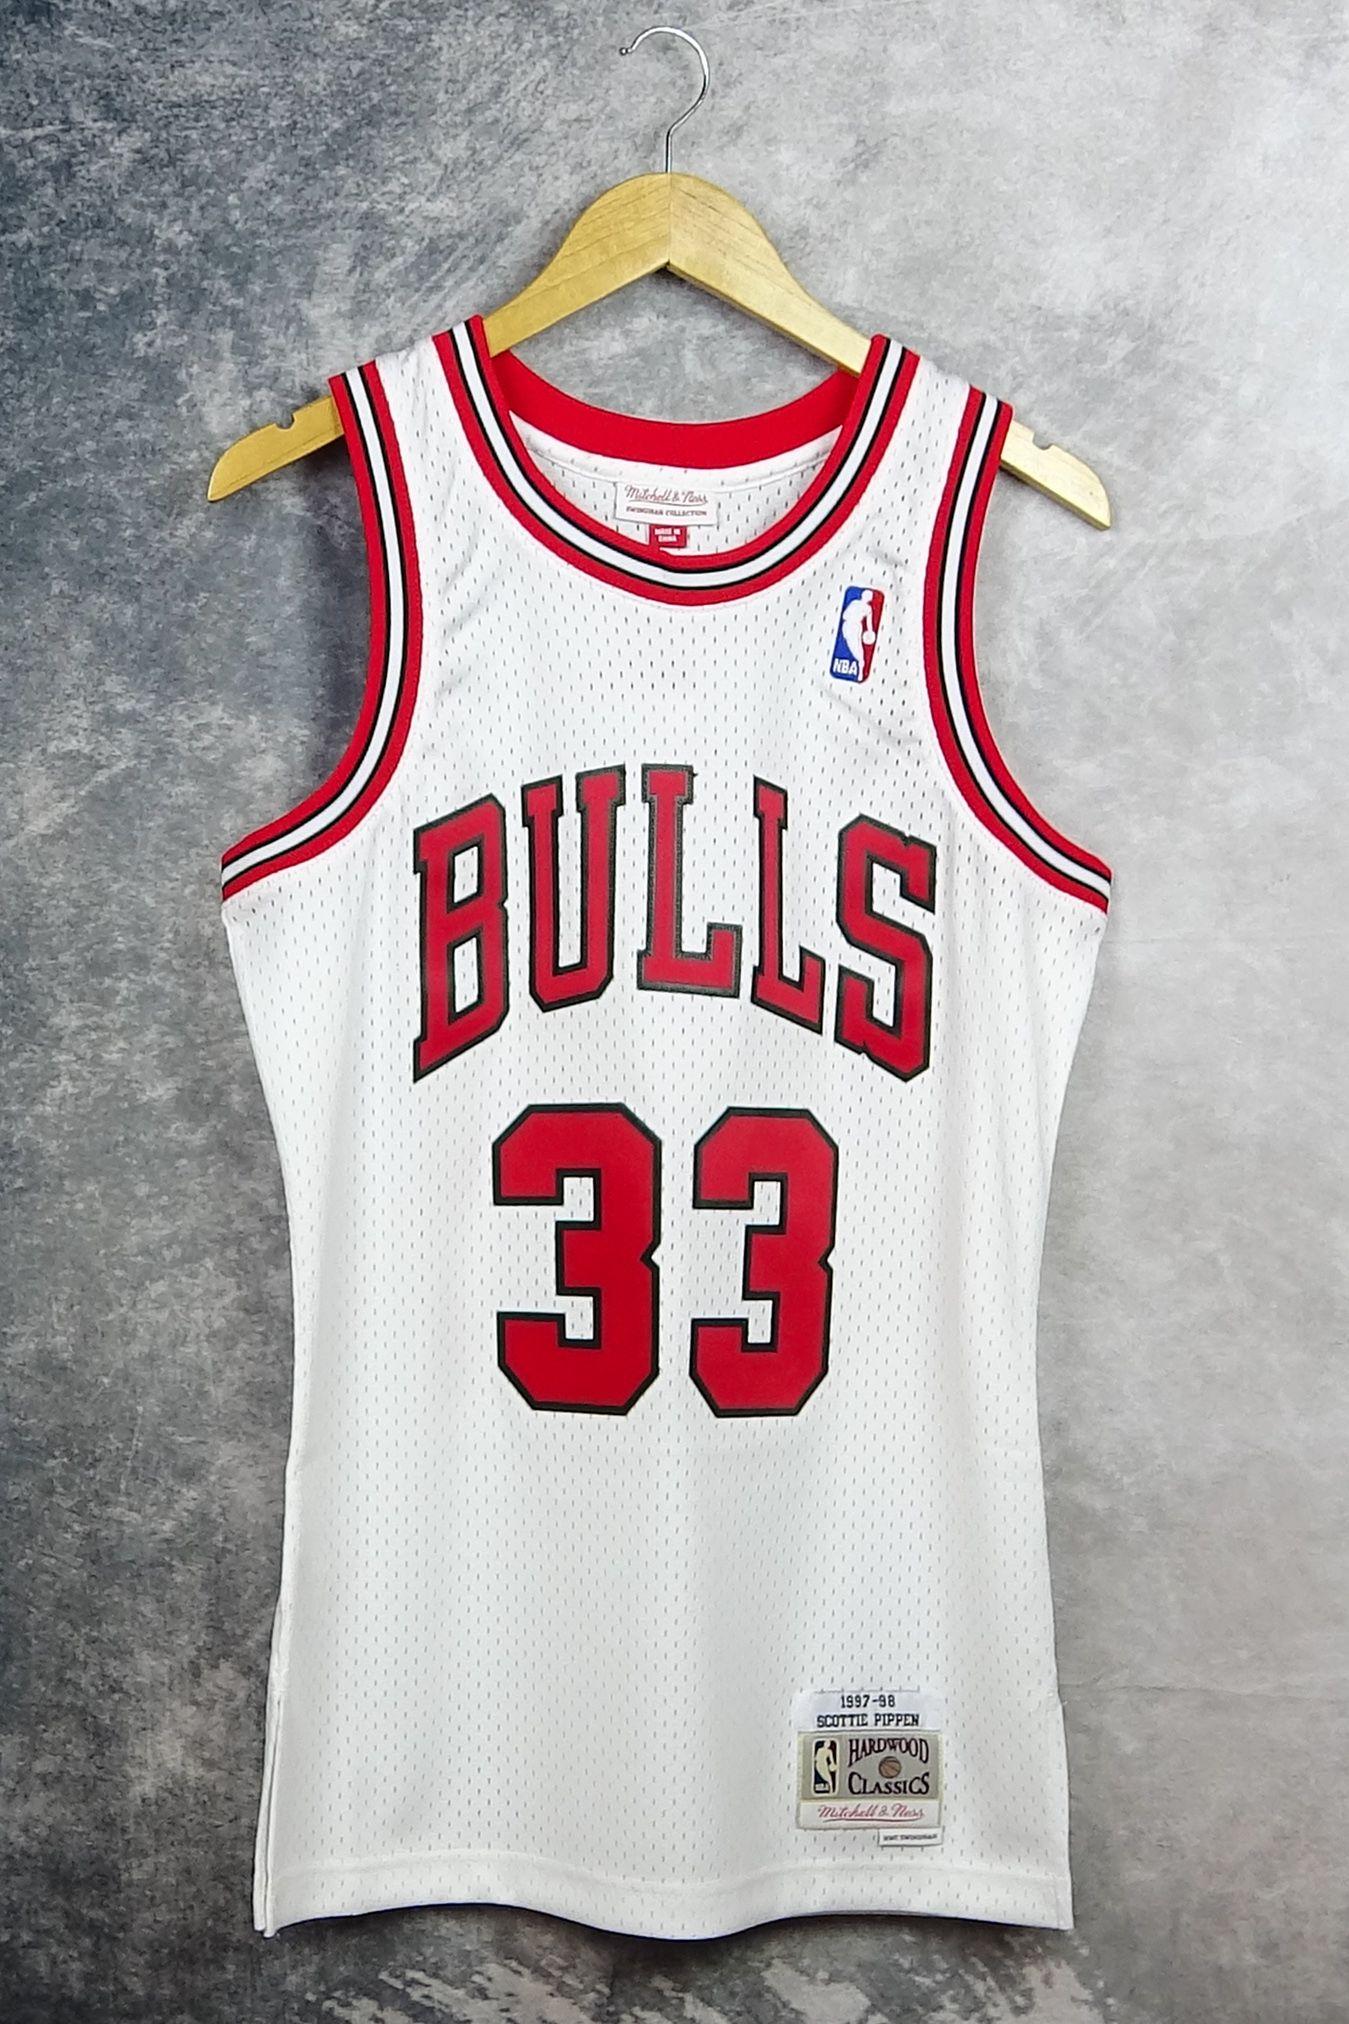 enaguas Probablemente anchura  33 Scottie Pippen. Chicago Bulls. Camiseta swingman. Retro NBA. Hardwood  Classics | Chicago bulls, Scottie pippen, Camisetas